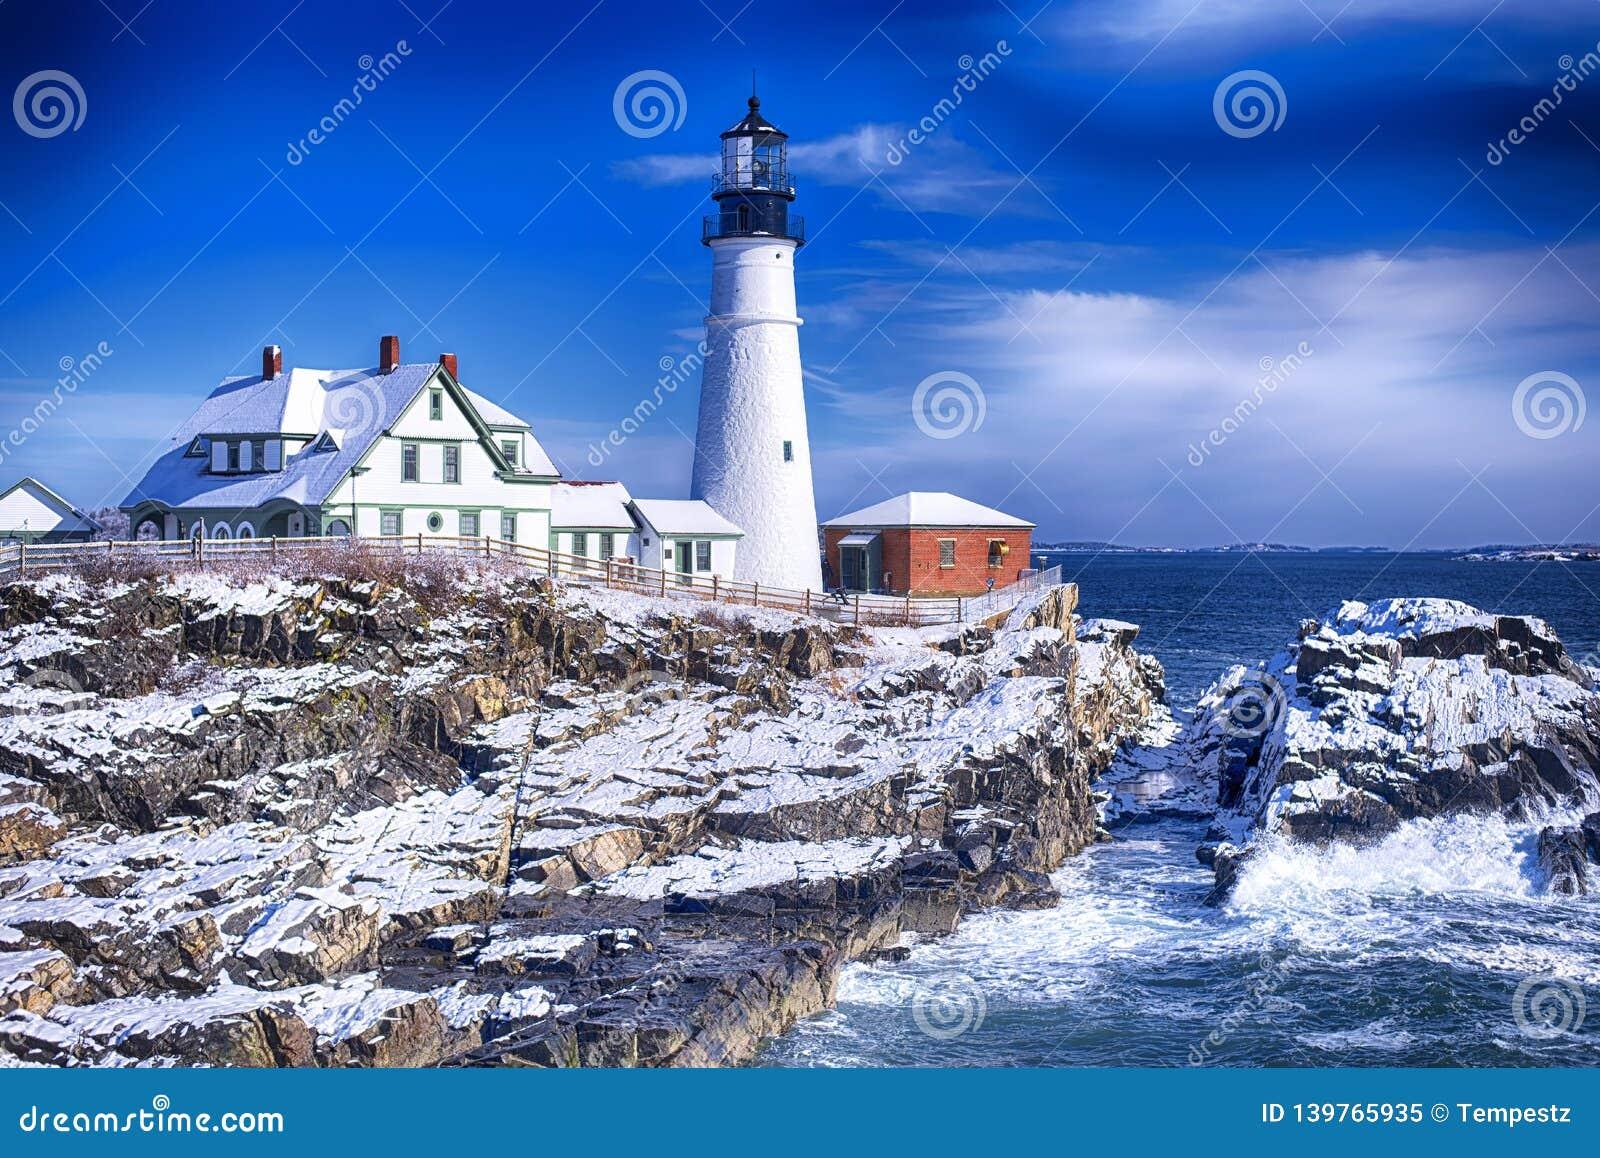 Portland Maine Headlight lighthouse wintertime